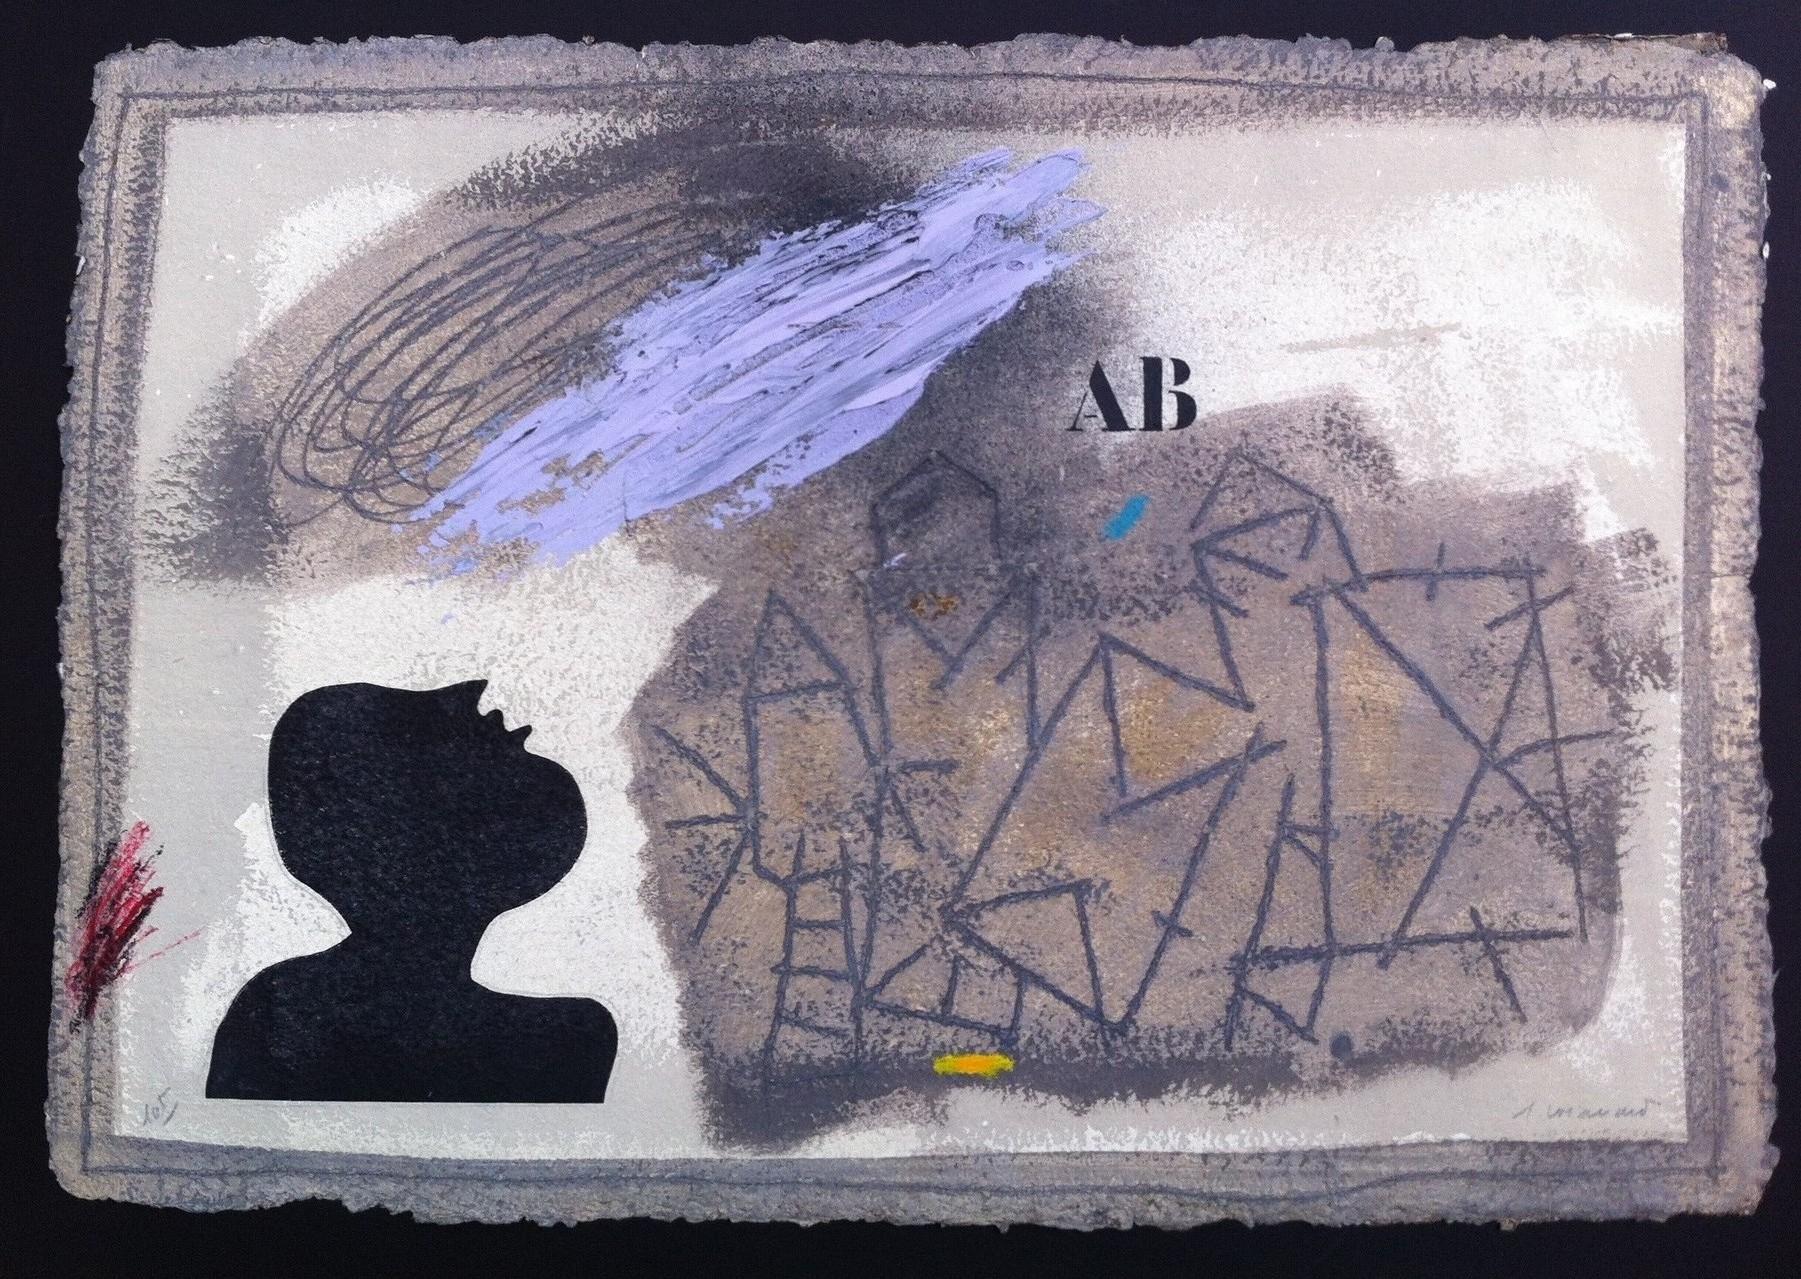 L'ombre bleue James Coignard